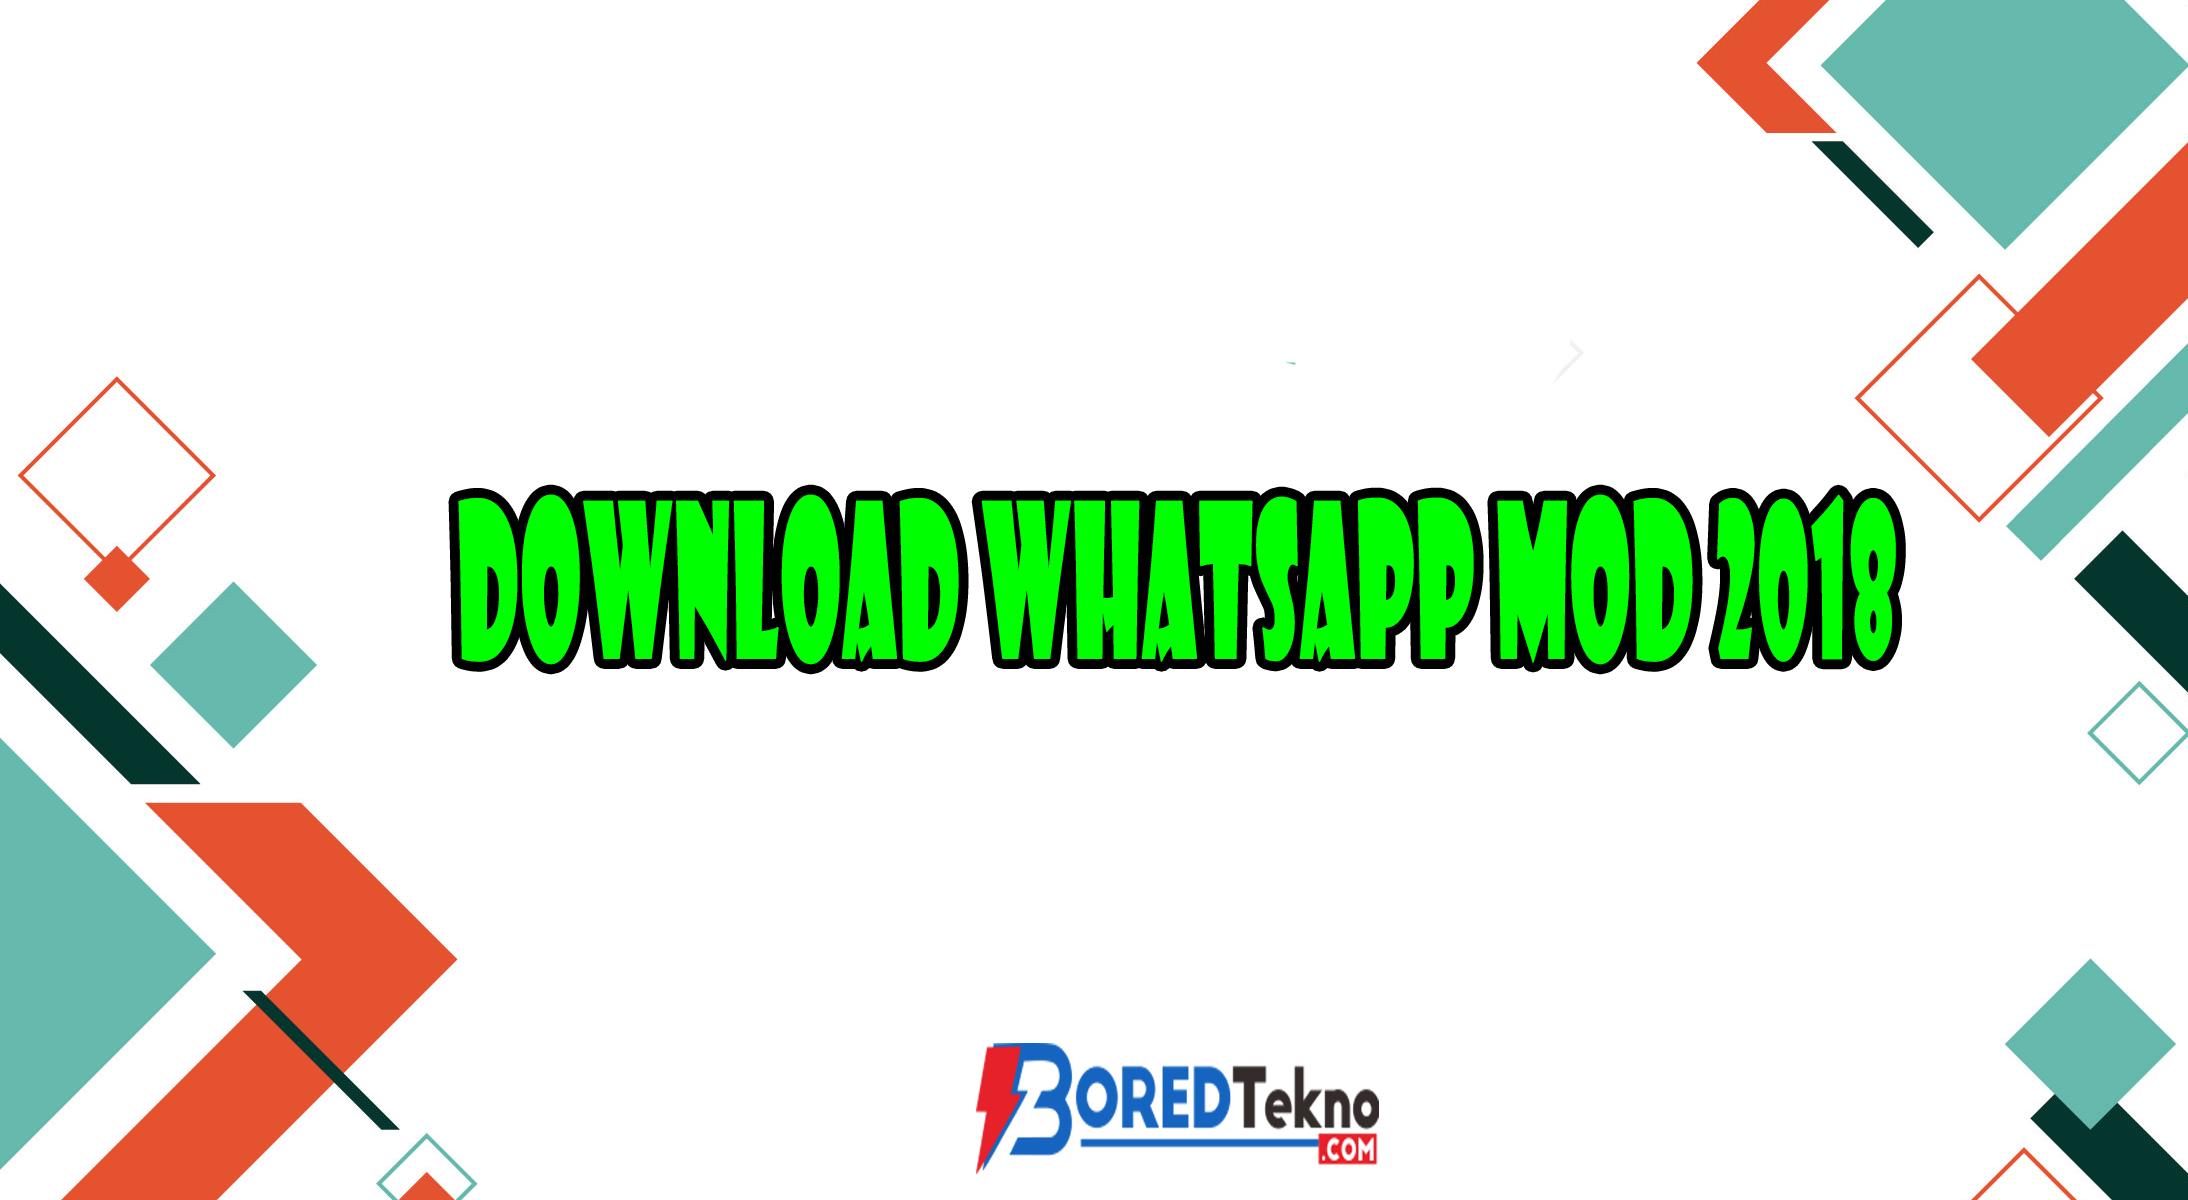 Download Whatsapp MOD 2018